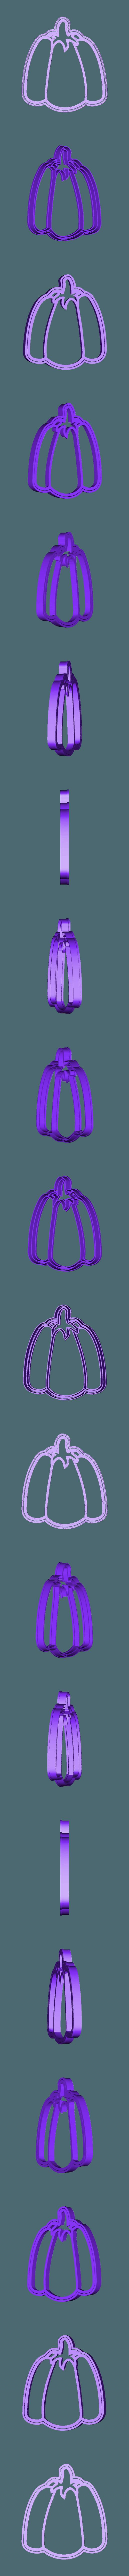 3.stl Télécharger fichier STL gratuit PACK CHAUSSURES ET CHAUSSURES - SCEAUX ECHANGEABLES - CHAUSSURES HALLOWEEN CUTTING - FONDANT MASS CUTTING AND pumpkin CLAY - 8 AND 10cm • Objet imprimable en 3D, Agos3D